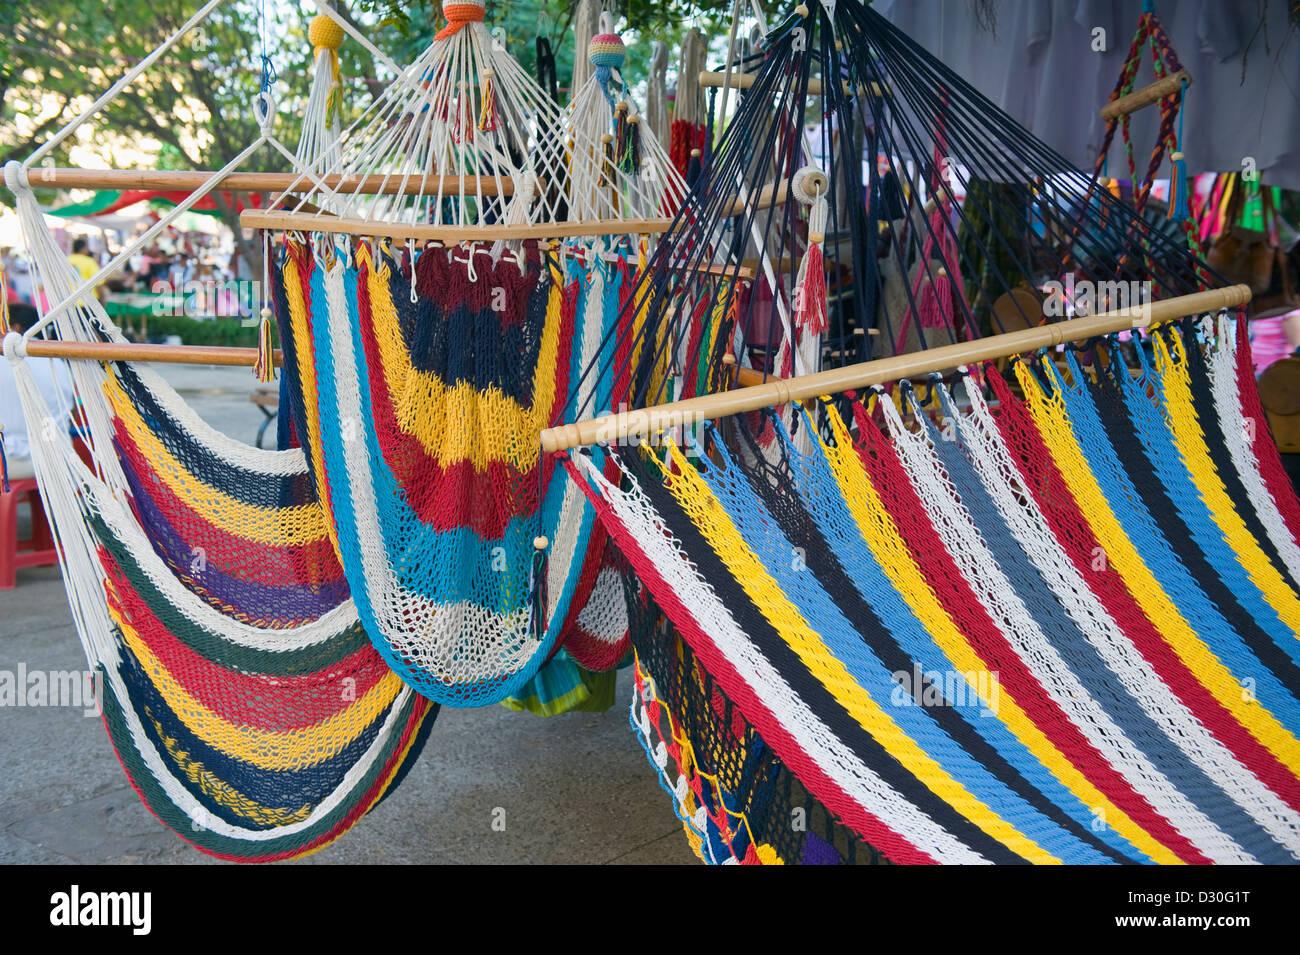 colorful hammocks, Leon, Nicaragua, Central America - Stock Image